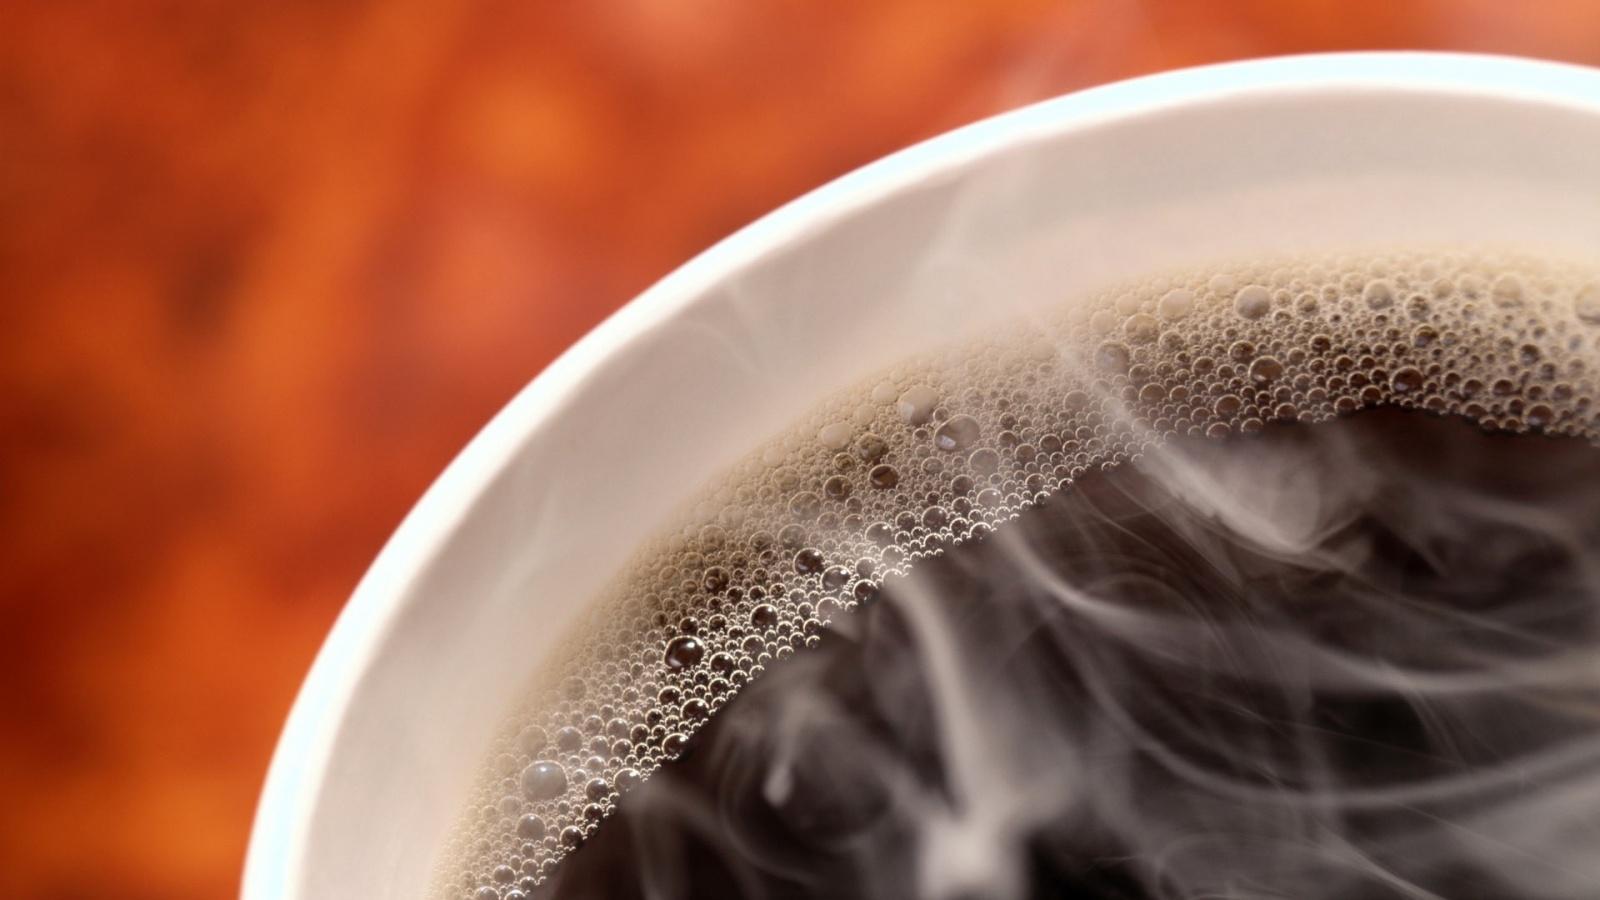 COFFEE - CUP ON CORNER